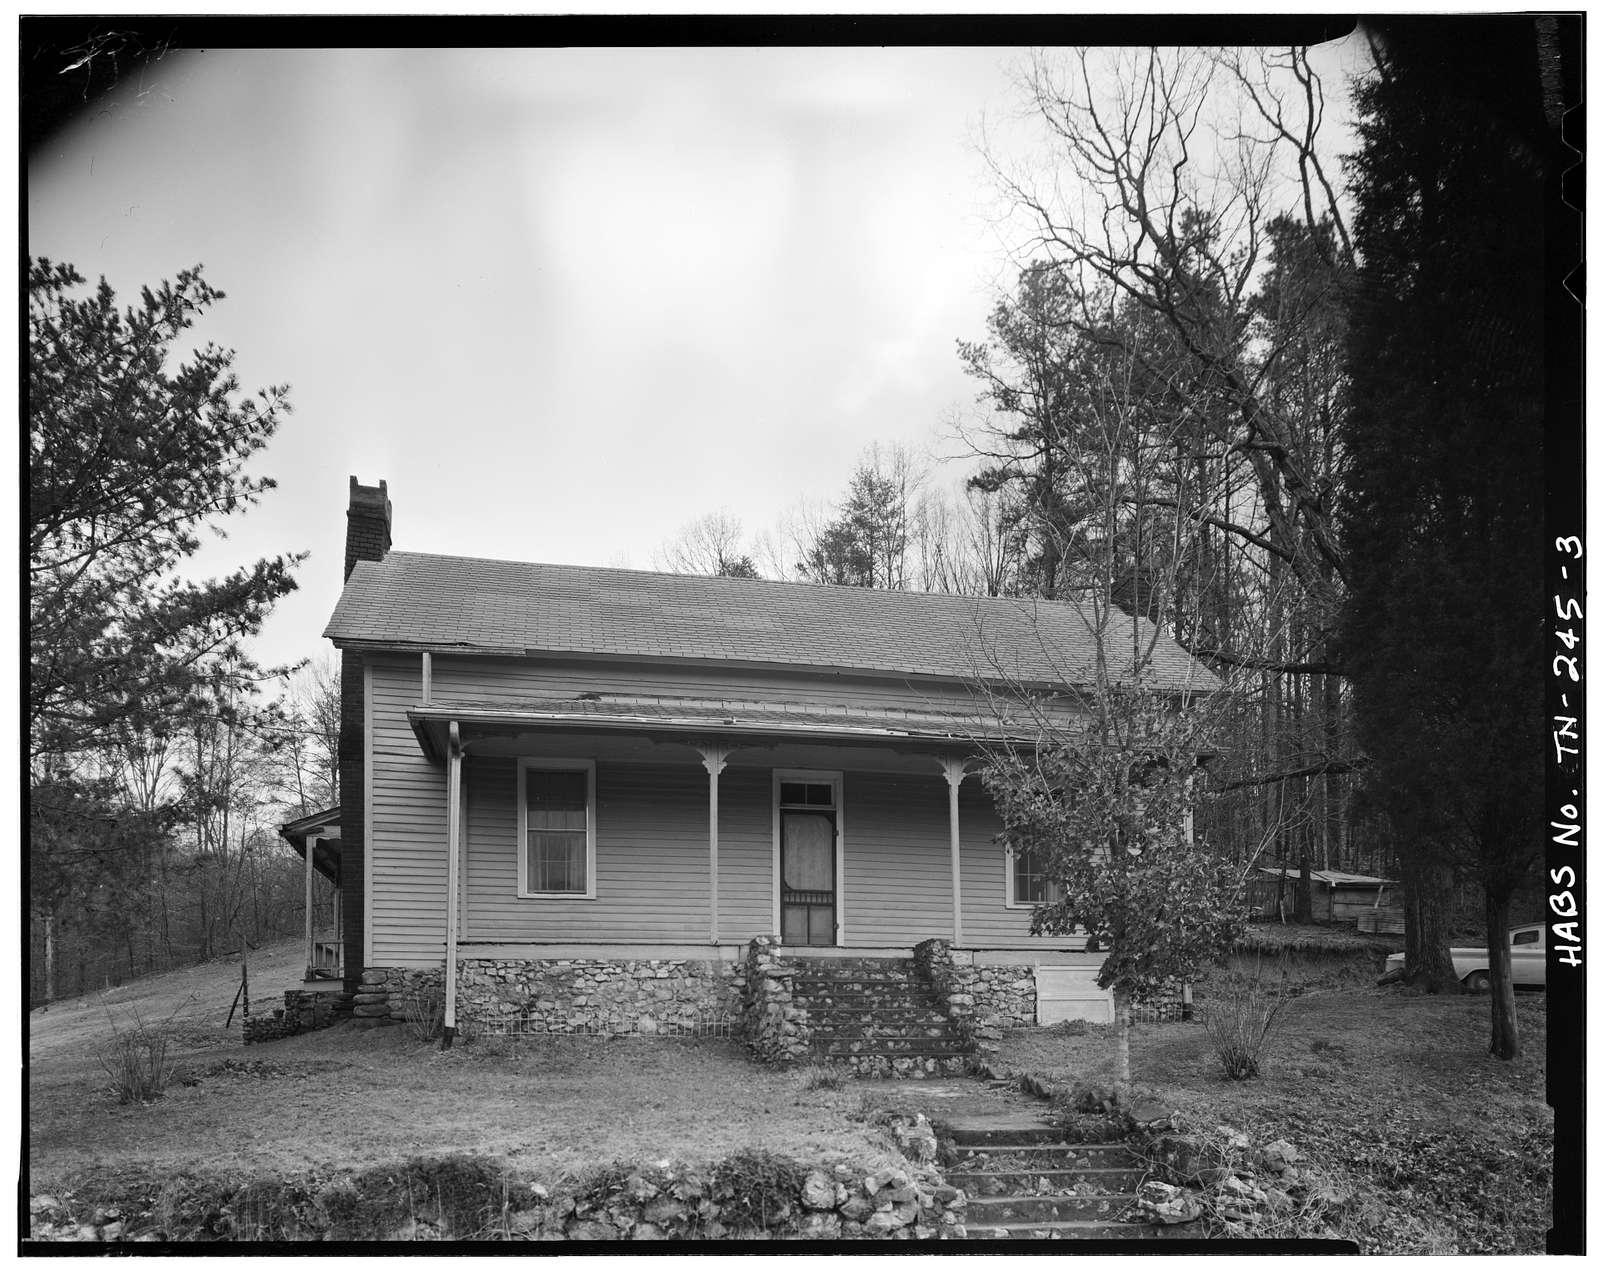 William Hixon House, Burnt Mill Road, Route 8, Chattanooga, Hamilton County, TN